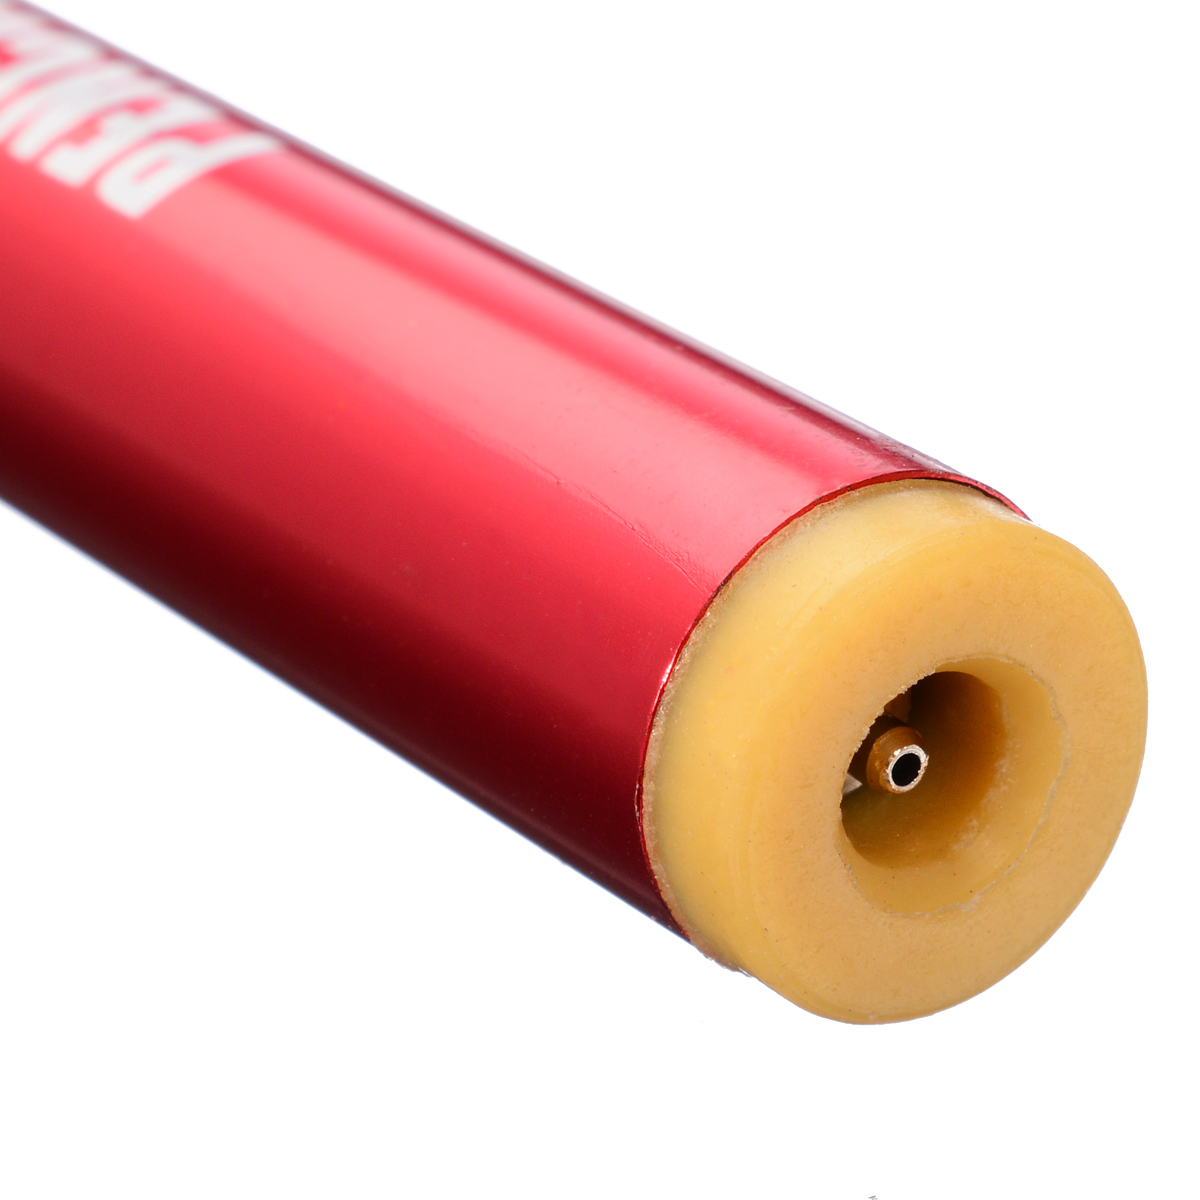 New Metal Gas Blow Tool Welding Torch Gun Mini Soldering Solder Iron Cordless Welding Pen Burner For Hot Air Blower